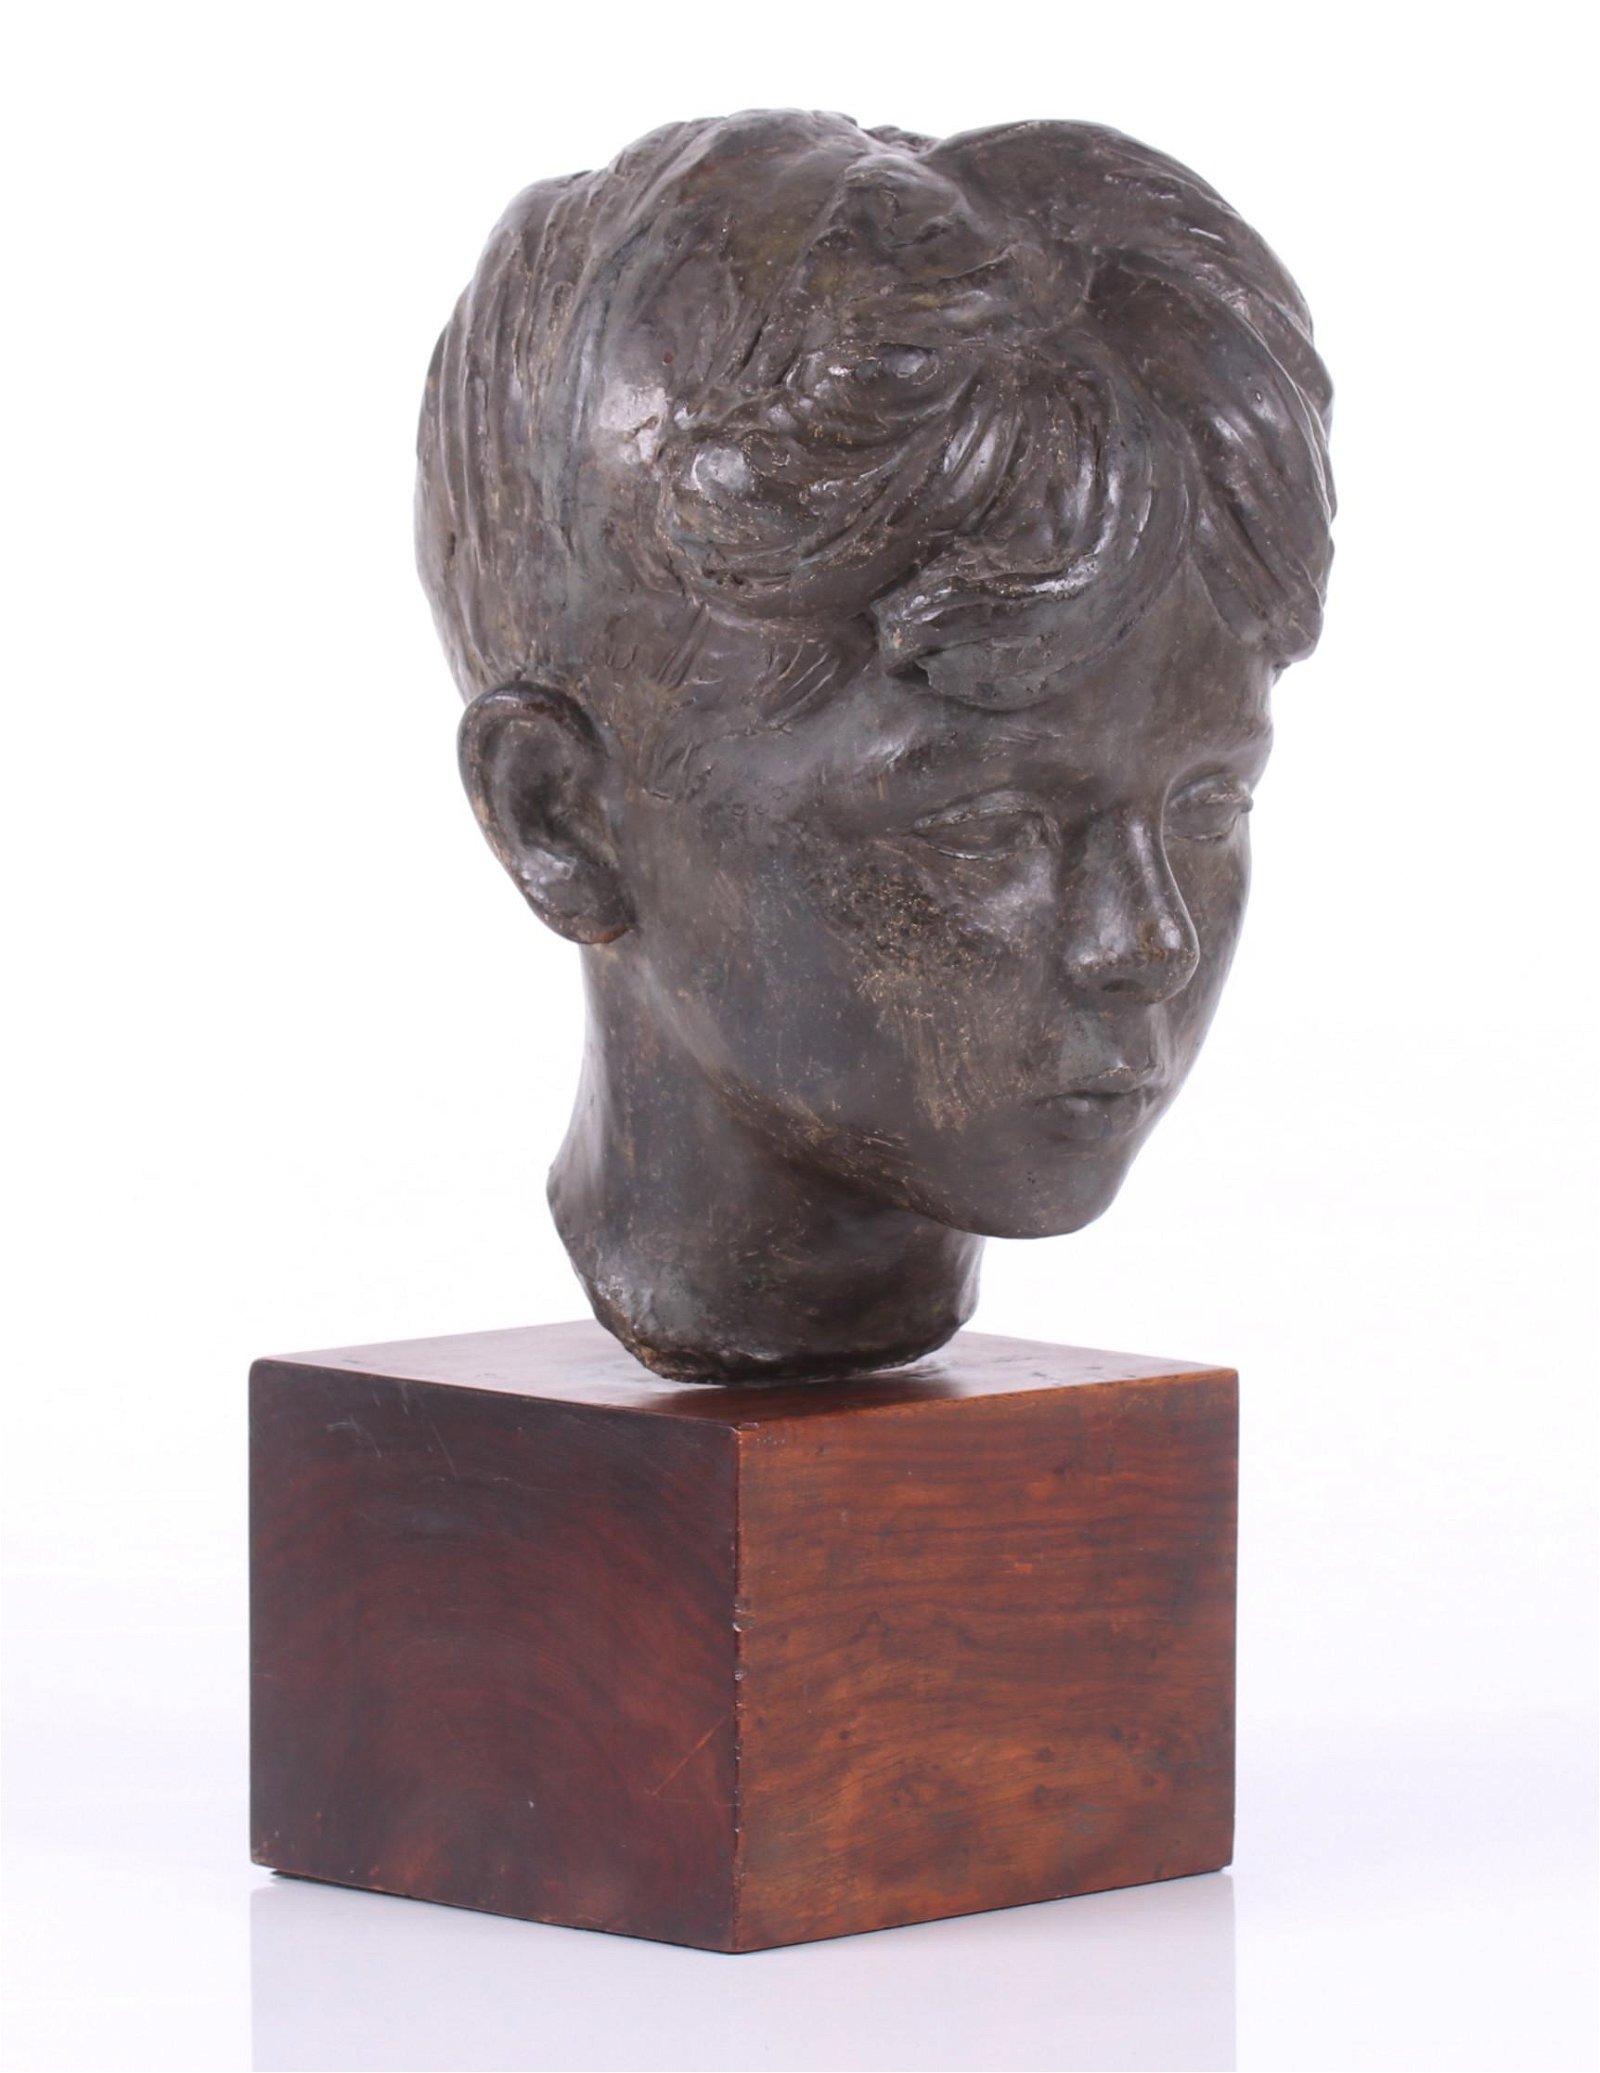 Harry Rosin (American 1897 - 1973) Sculpture